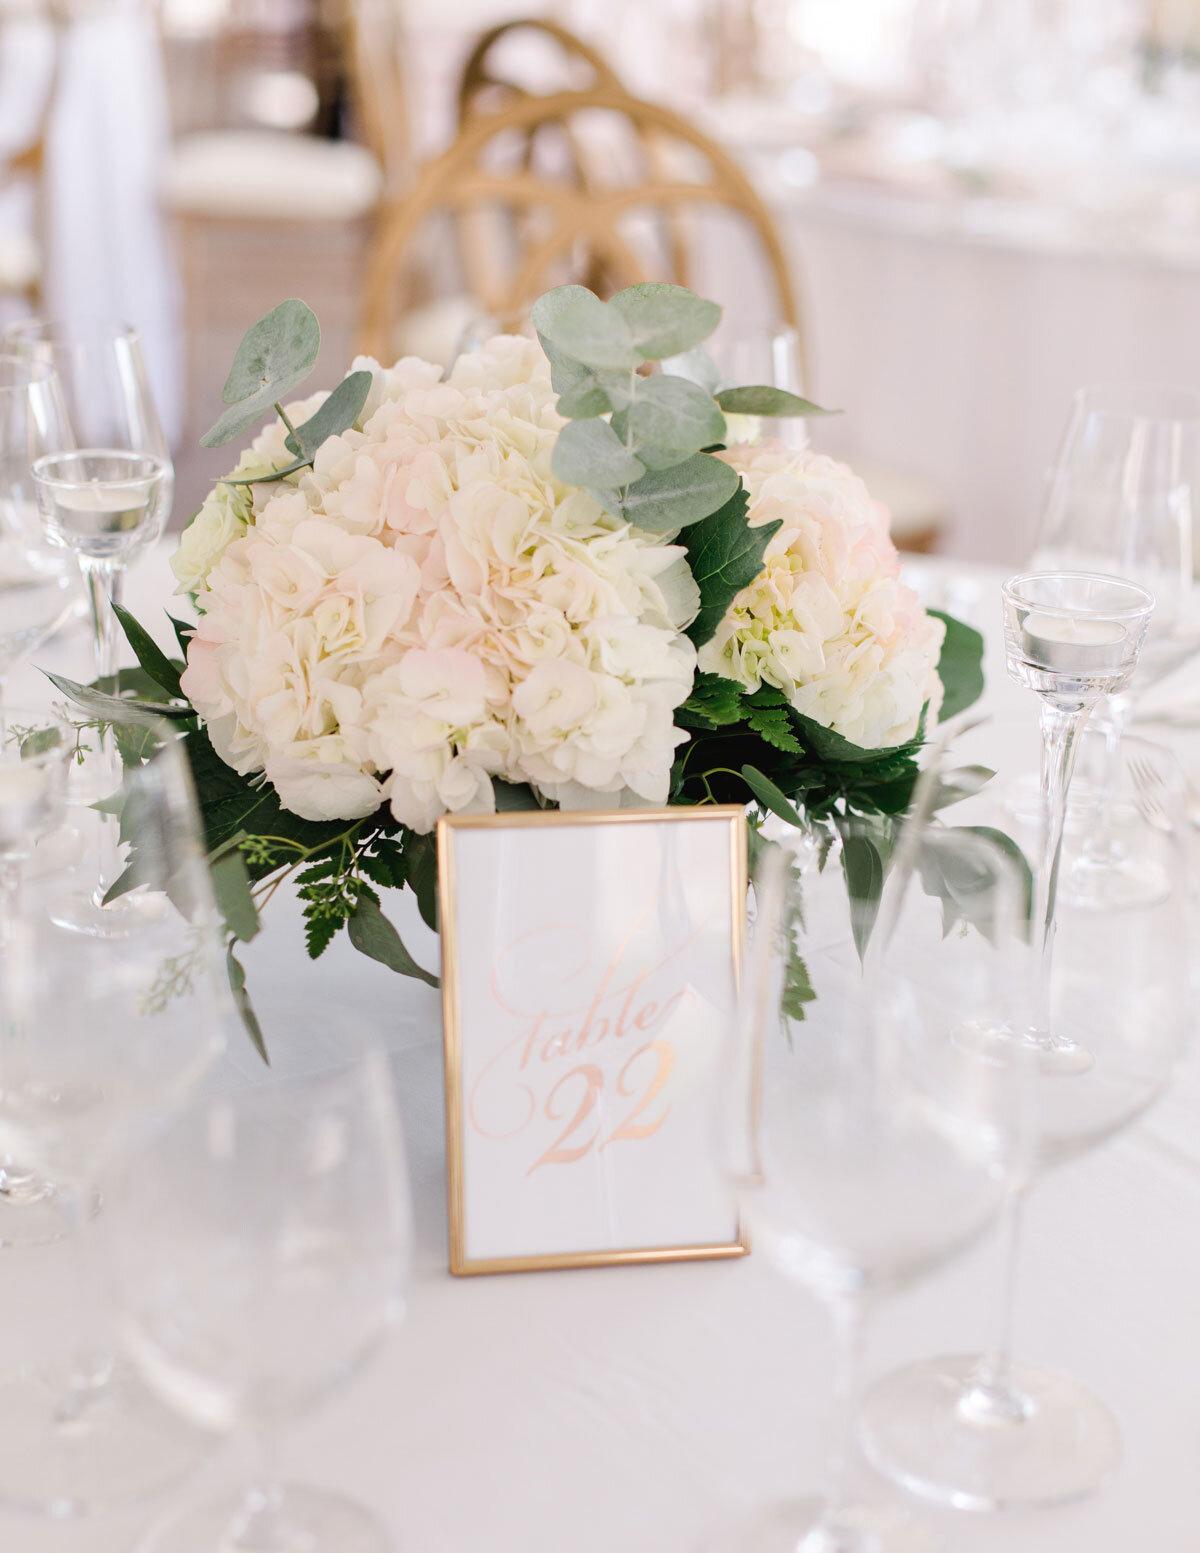 Chateau-des-Charmes-Wedding-Summer-Vineyard-Bride-Niagara-on-the-Lake-photos-by-Gemini-Photography-Ontario-0051.jpg